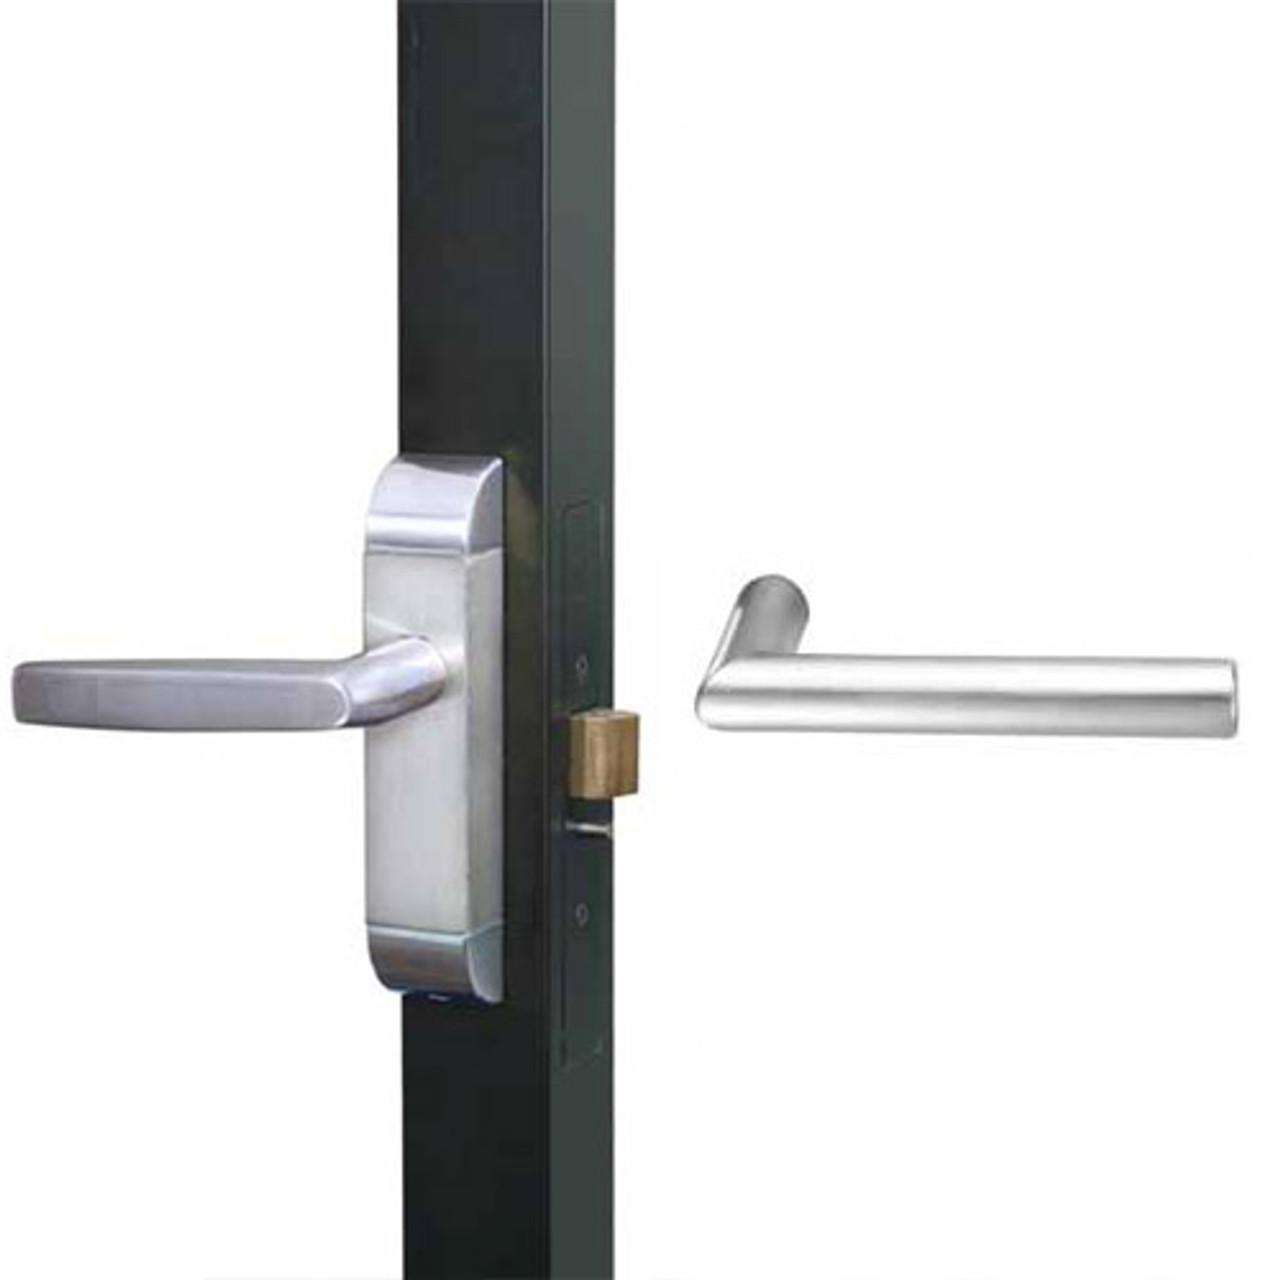 4600M-MI-542-US32 Adams Rite MI Designer Deadlatch handle in Bright Stainless Finish